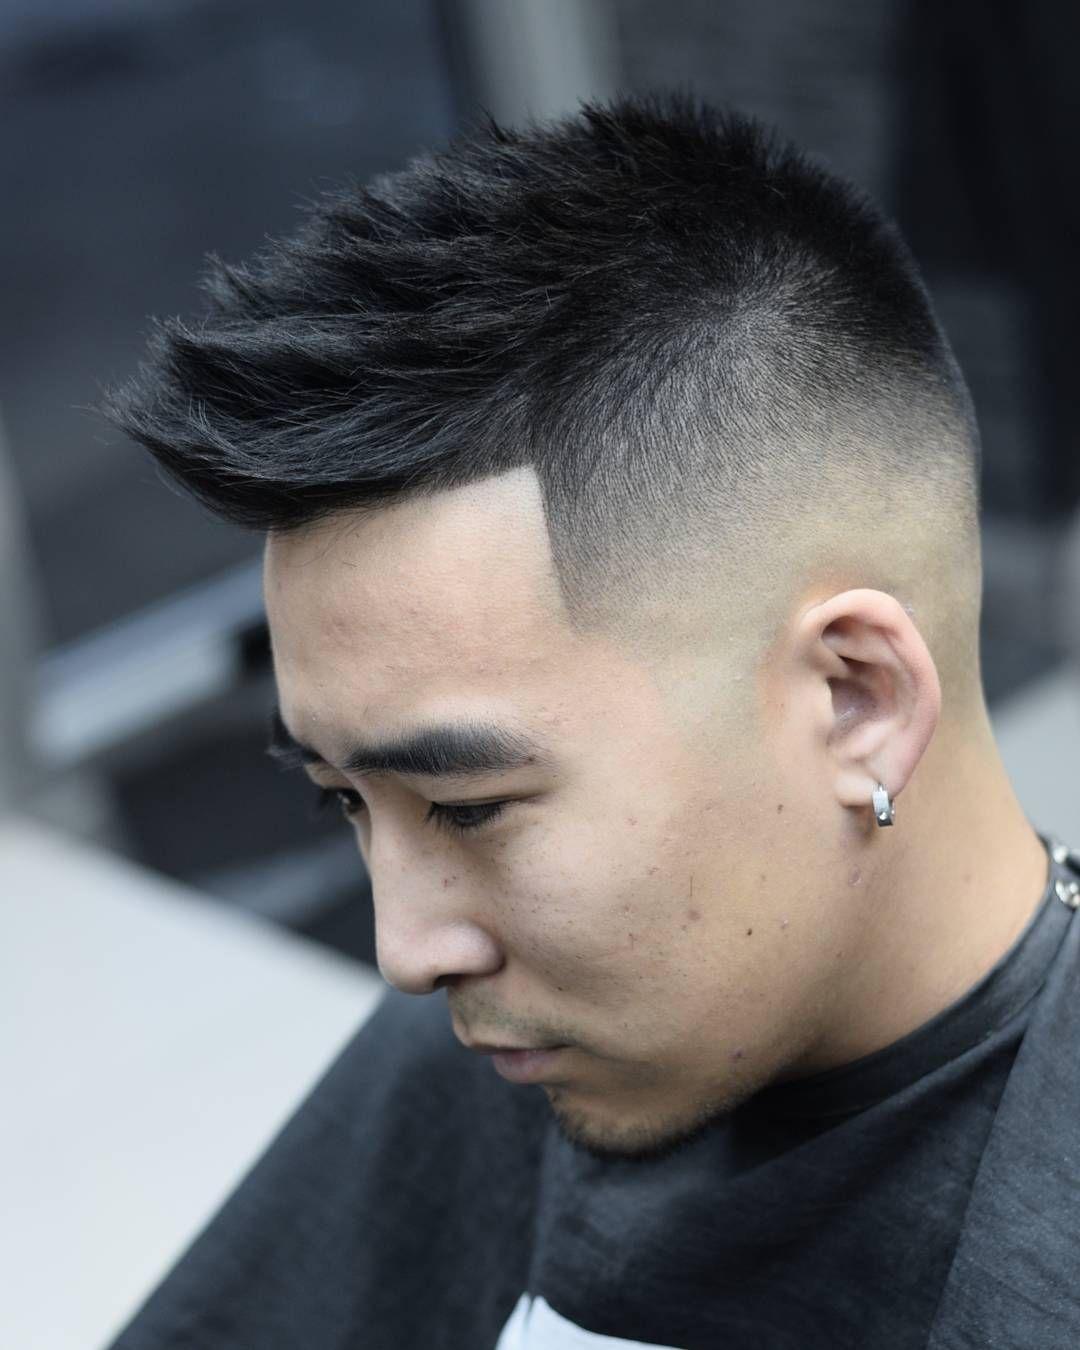 29 Best Hairstyles For Asian Men 2020 Styles Asian Men Hairstyle Asian Fade Haircut Asian Man Haircut